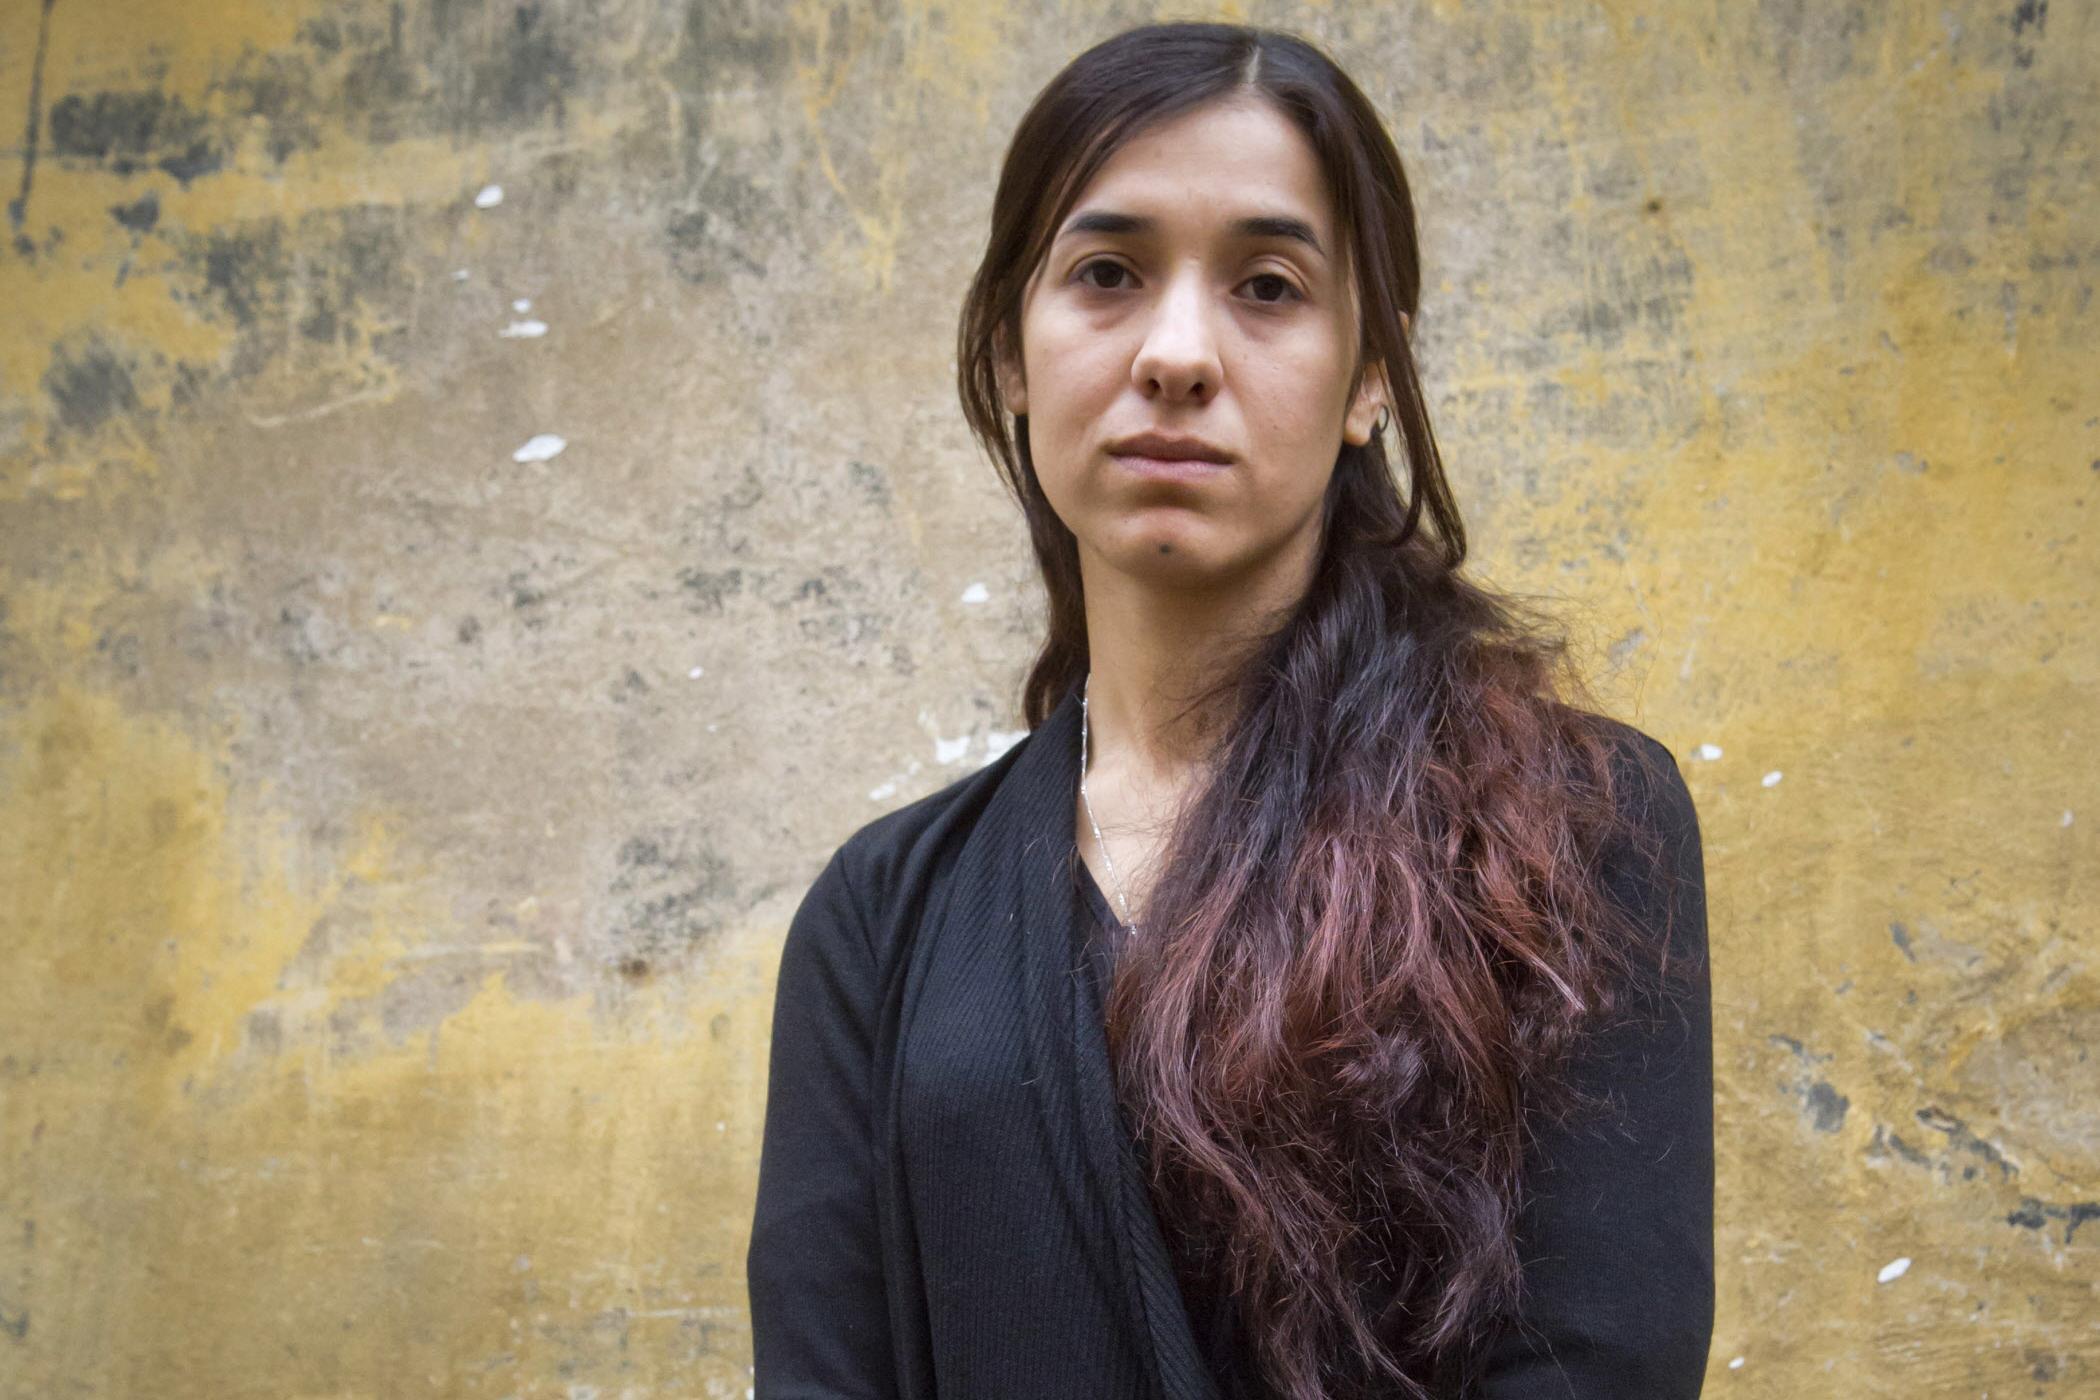 I was raped everyday: Yazidi girl speaks of horrors of